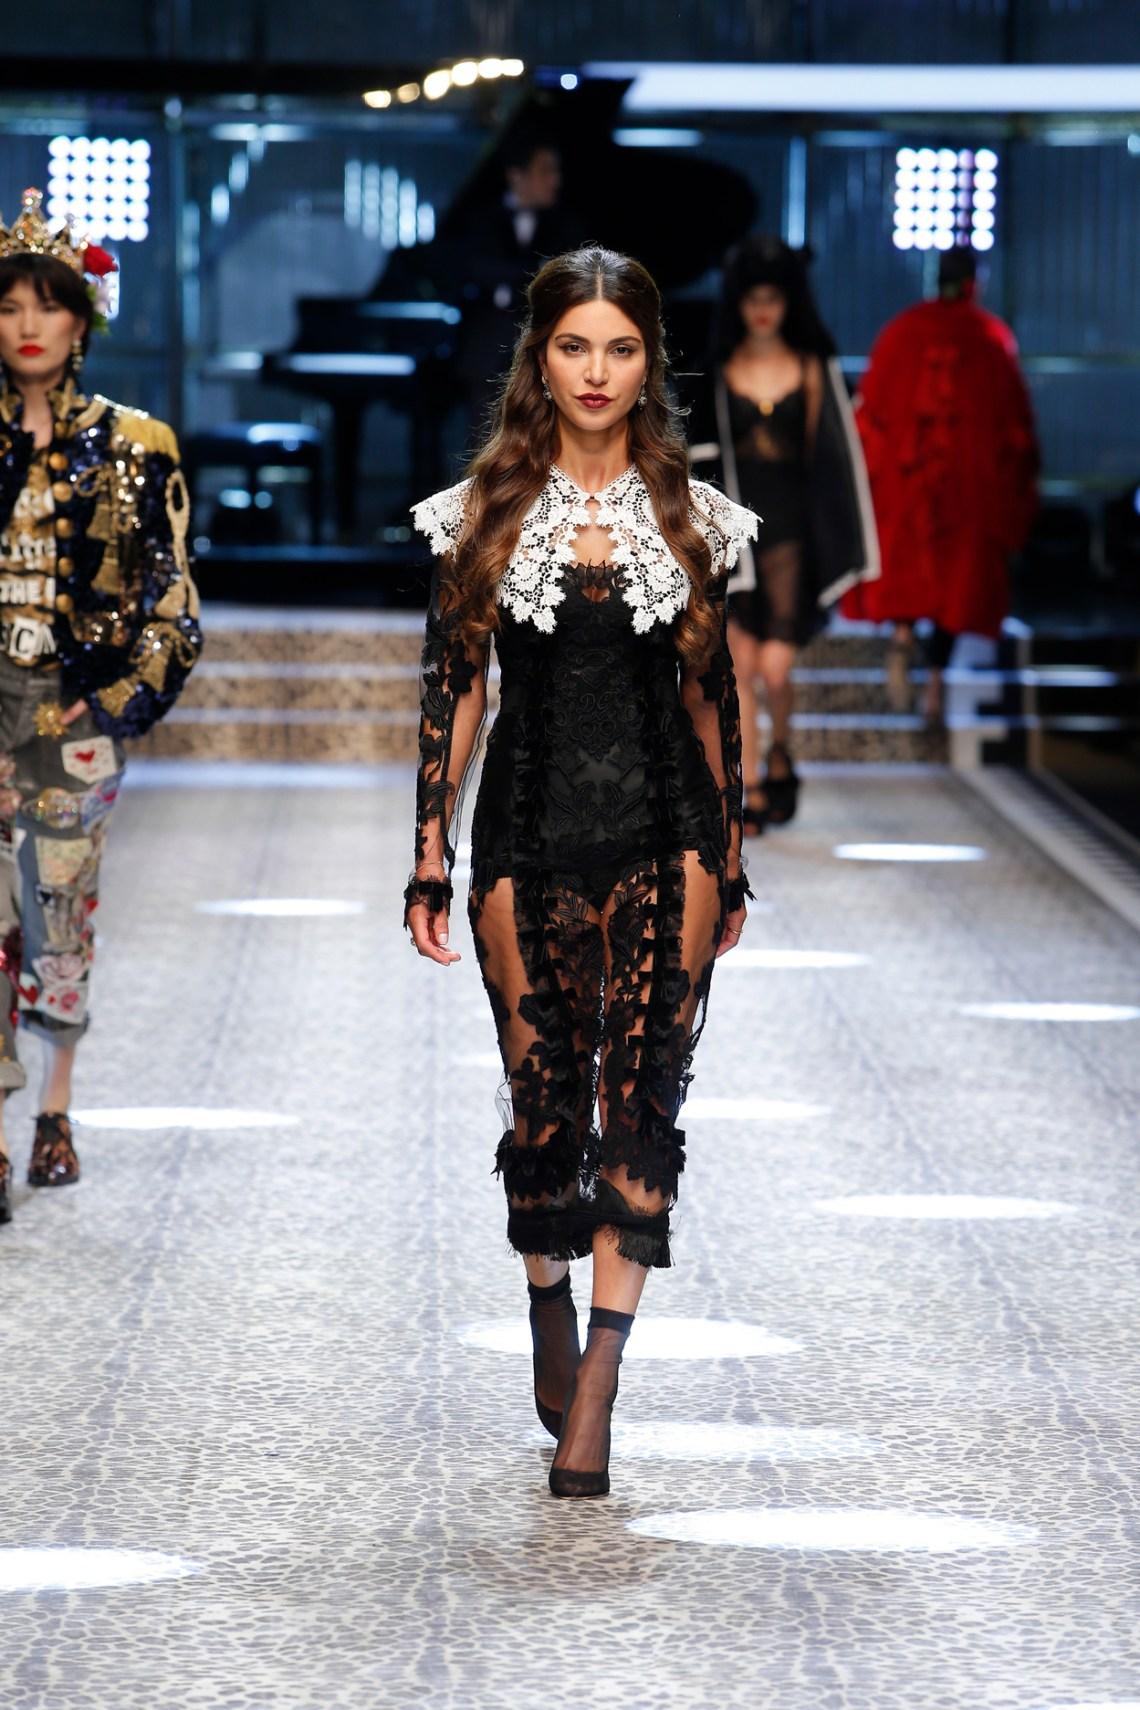 dolce-and-gabbana-fall-winter-2017-18-women-fashion-show-runway-06